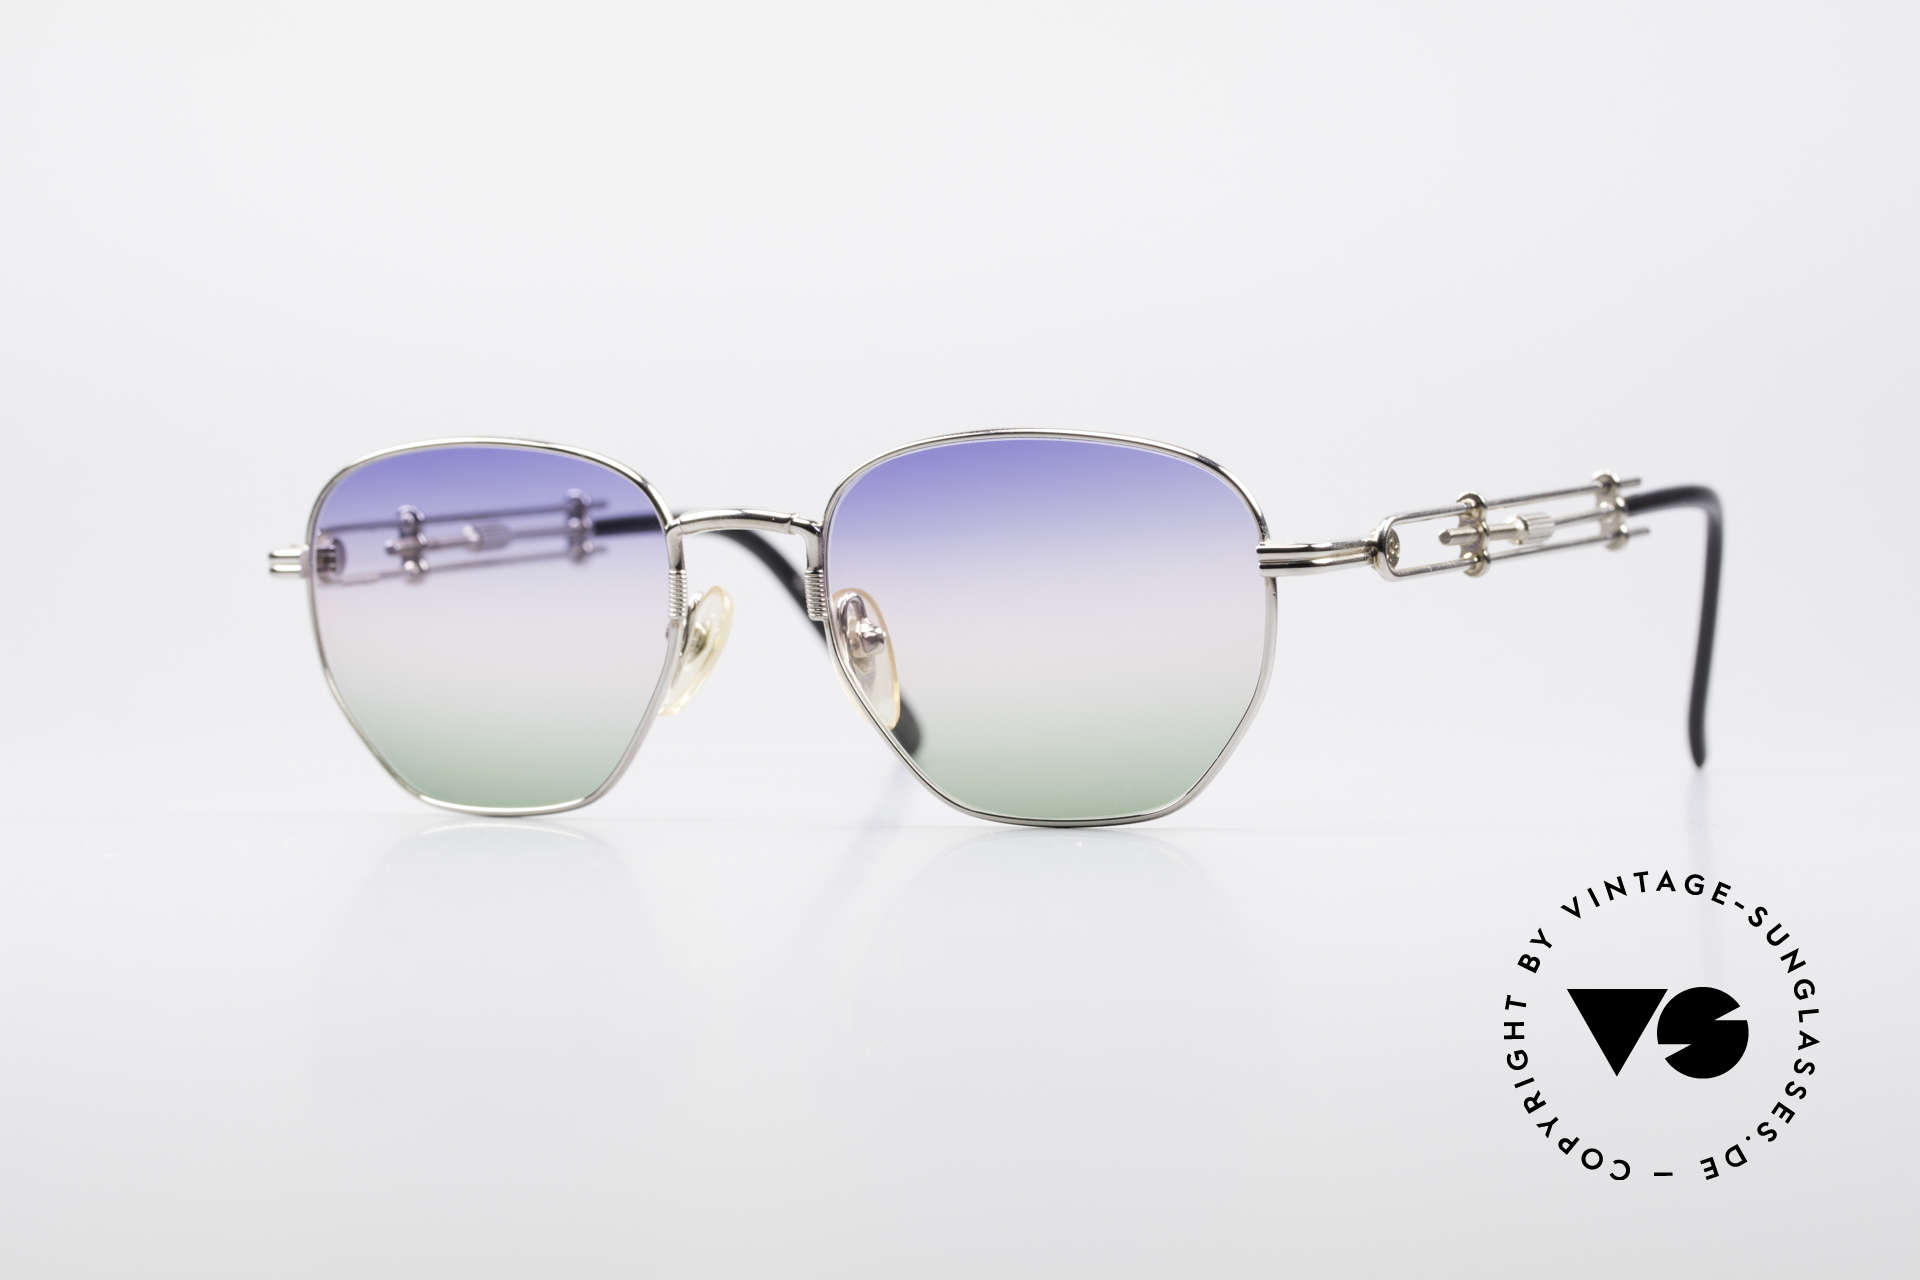 Jean Paul Gaultier 55-4174 Adjustable Vintage Frame, unique designer sunglasses by Jean Paul GAULTIER, Made for Men and Women